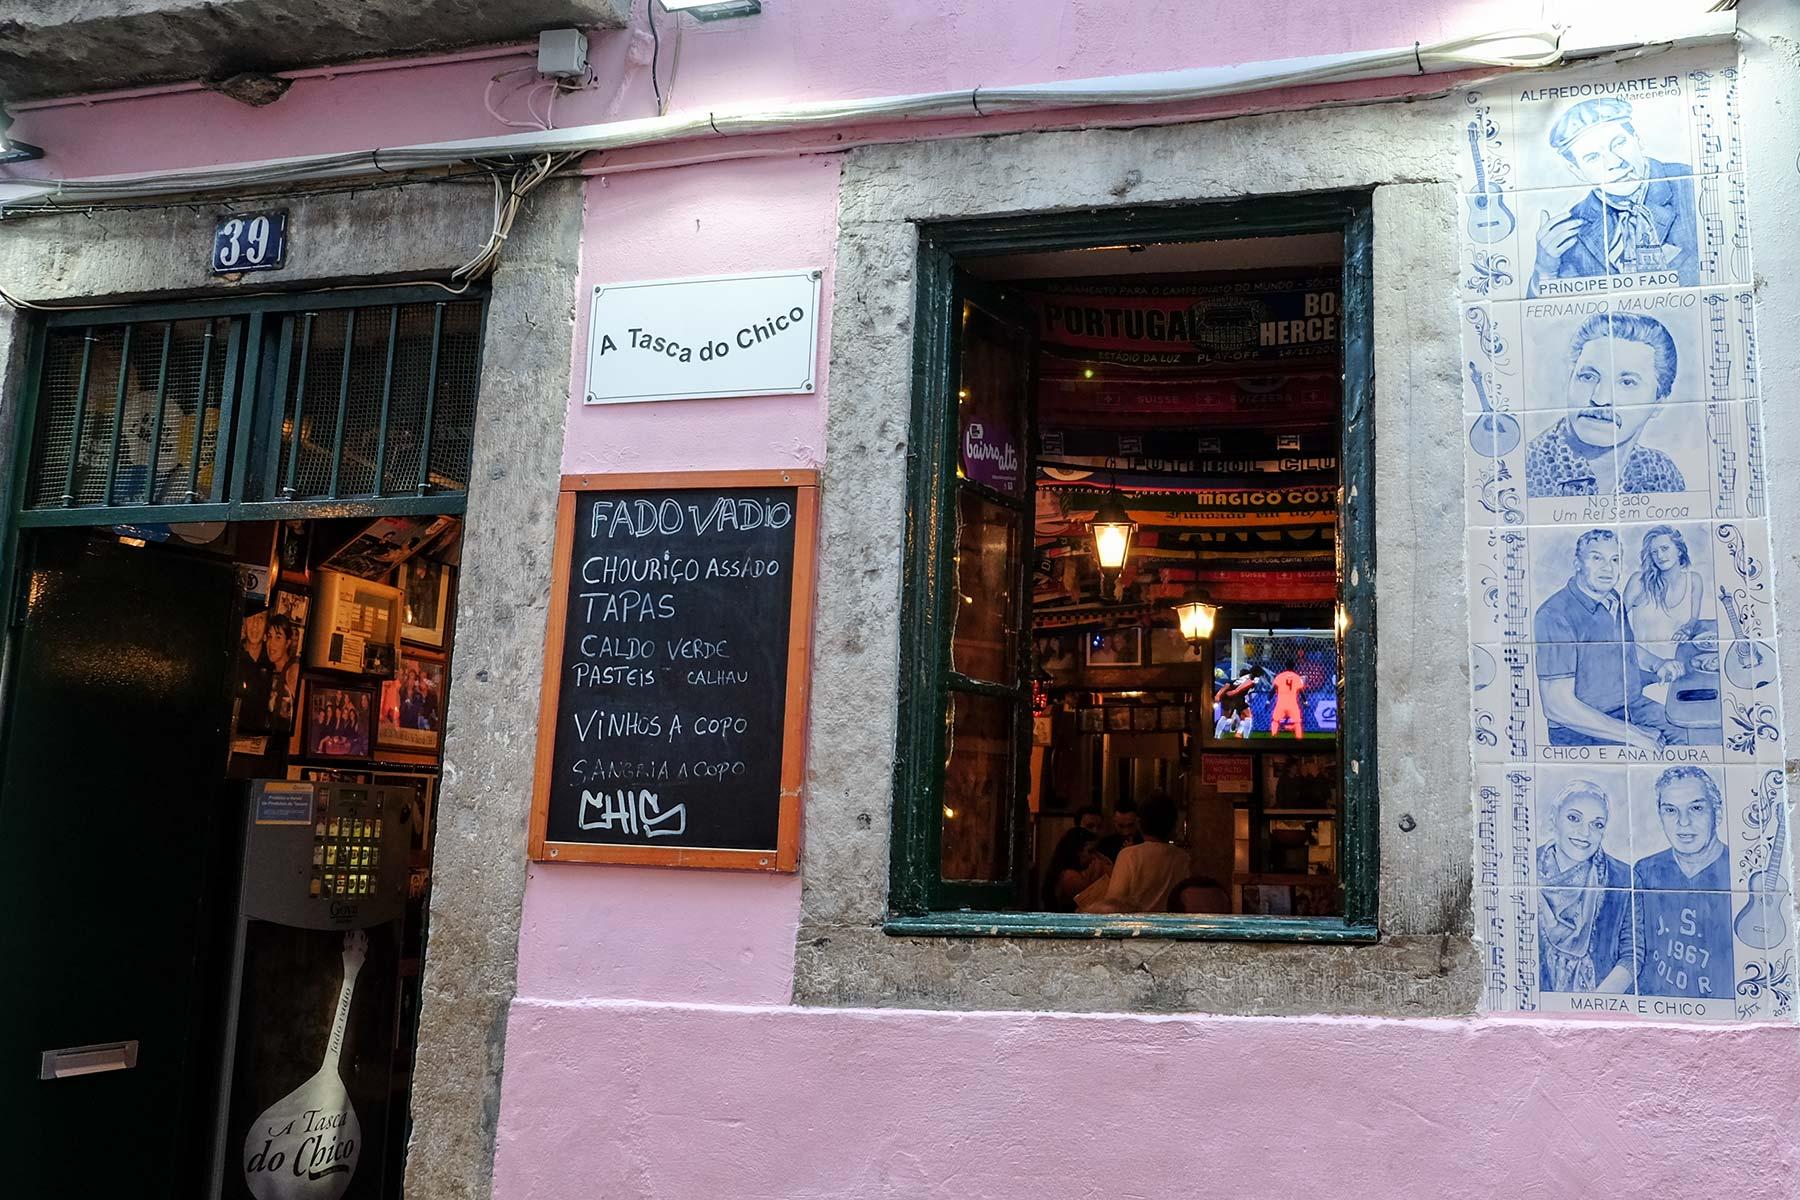 Live Fado Bar Tasca Do Chico in Lissabon, Portugal